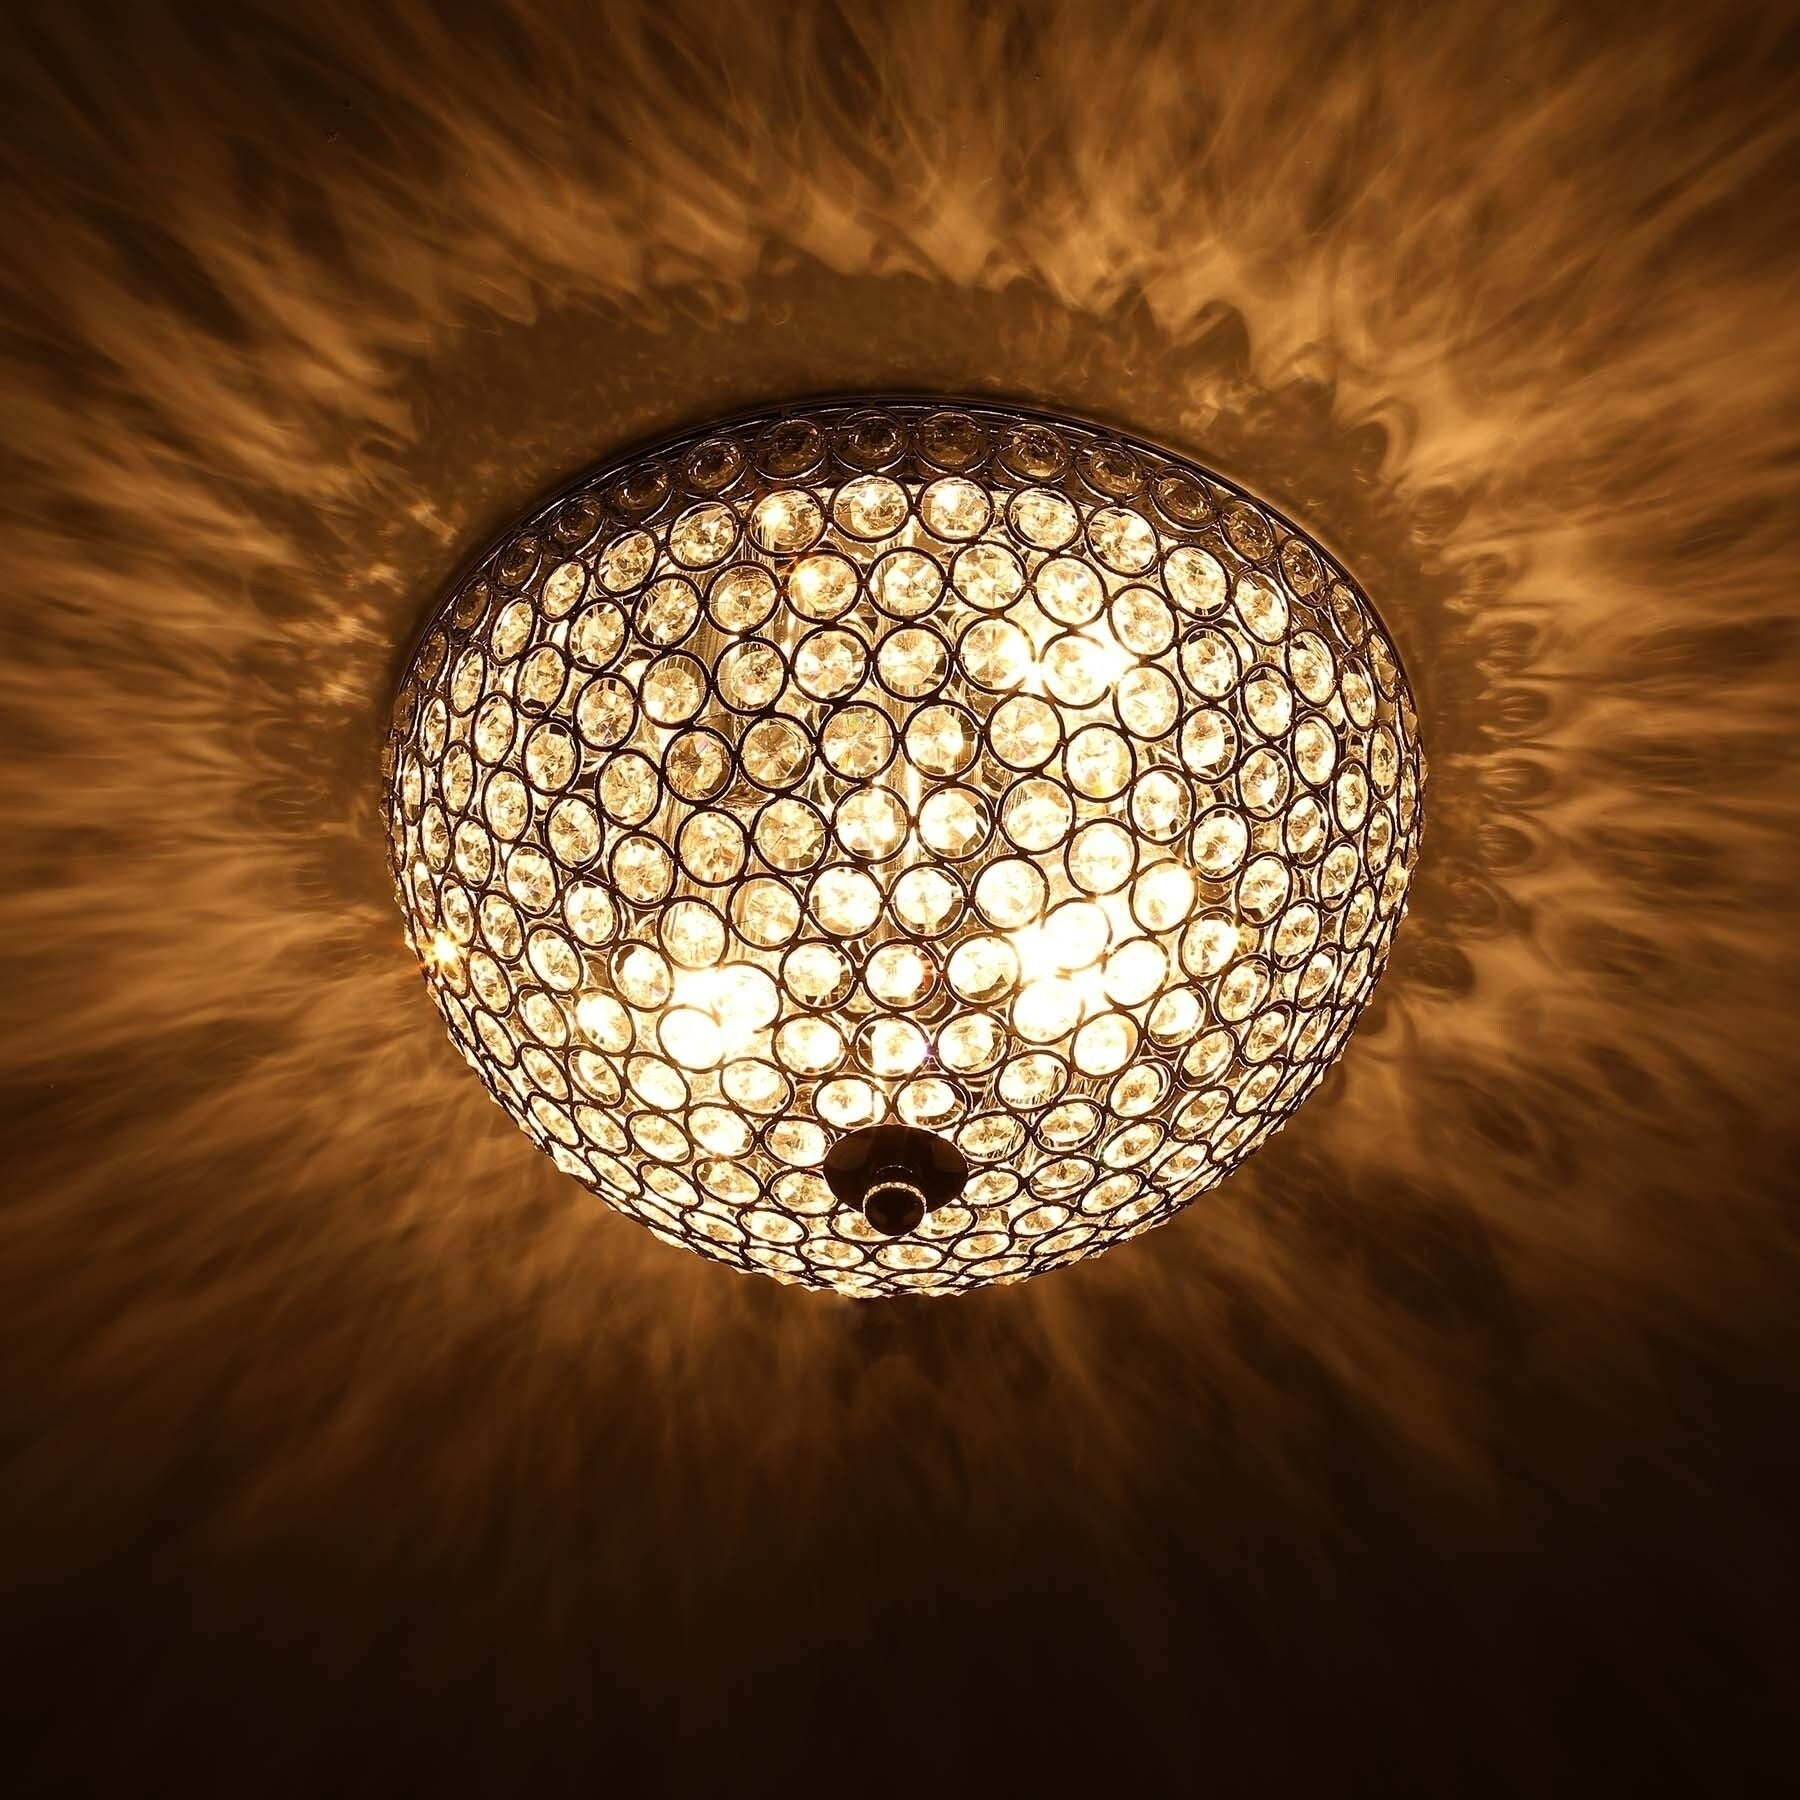 Co Z 2 Light Crystal Flush Mount Ceiling Light Fixture Overstock 28422695